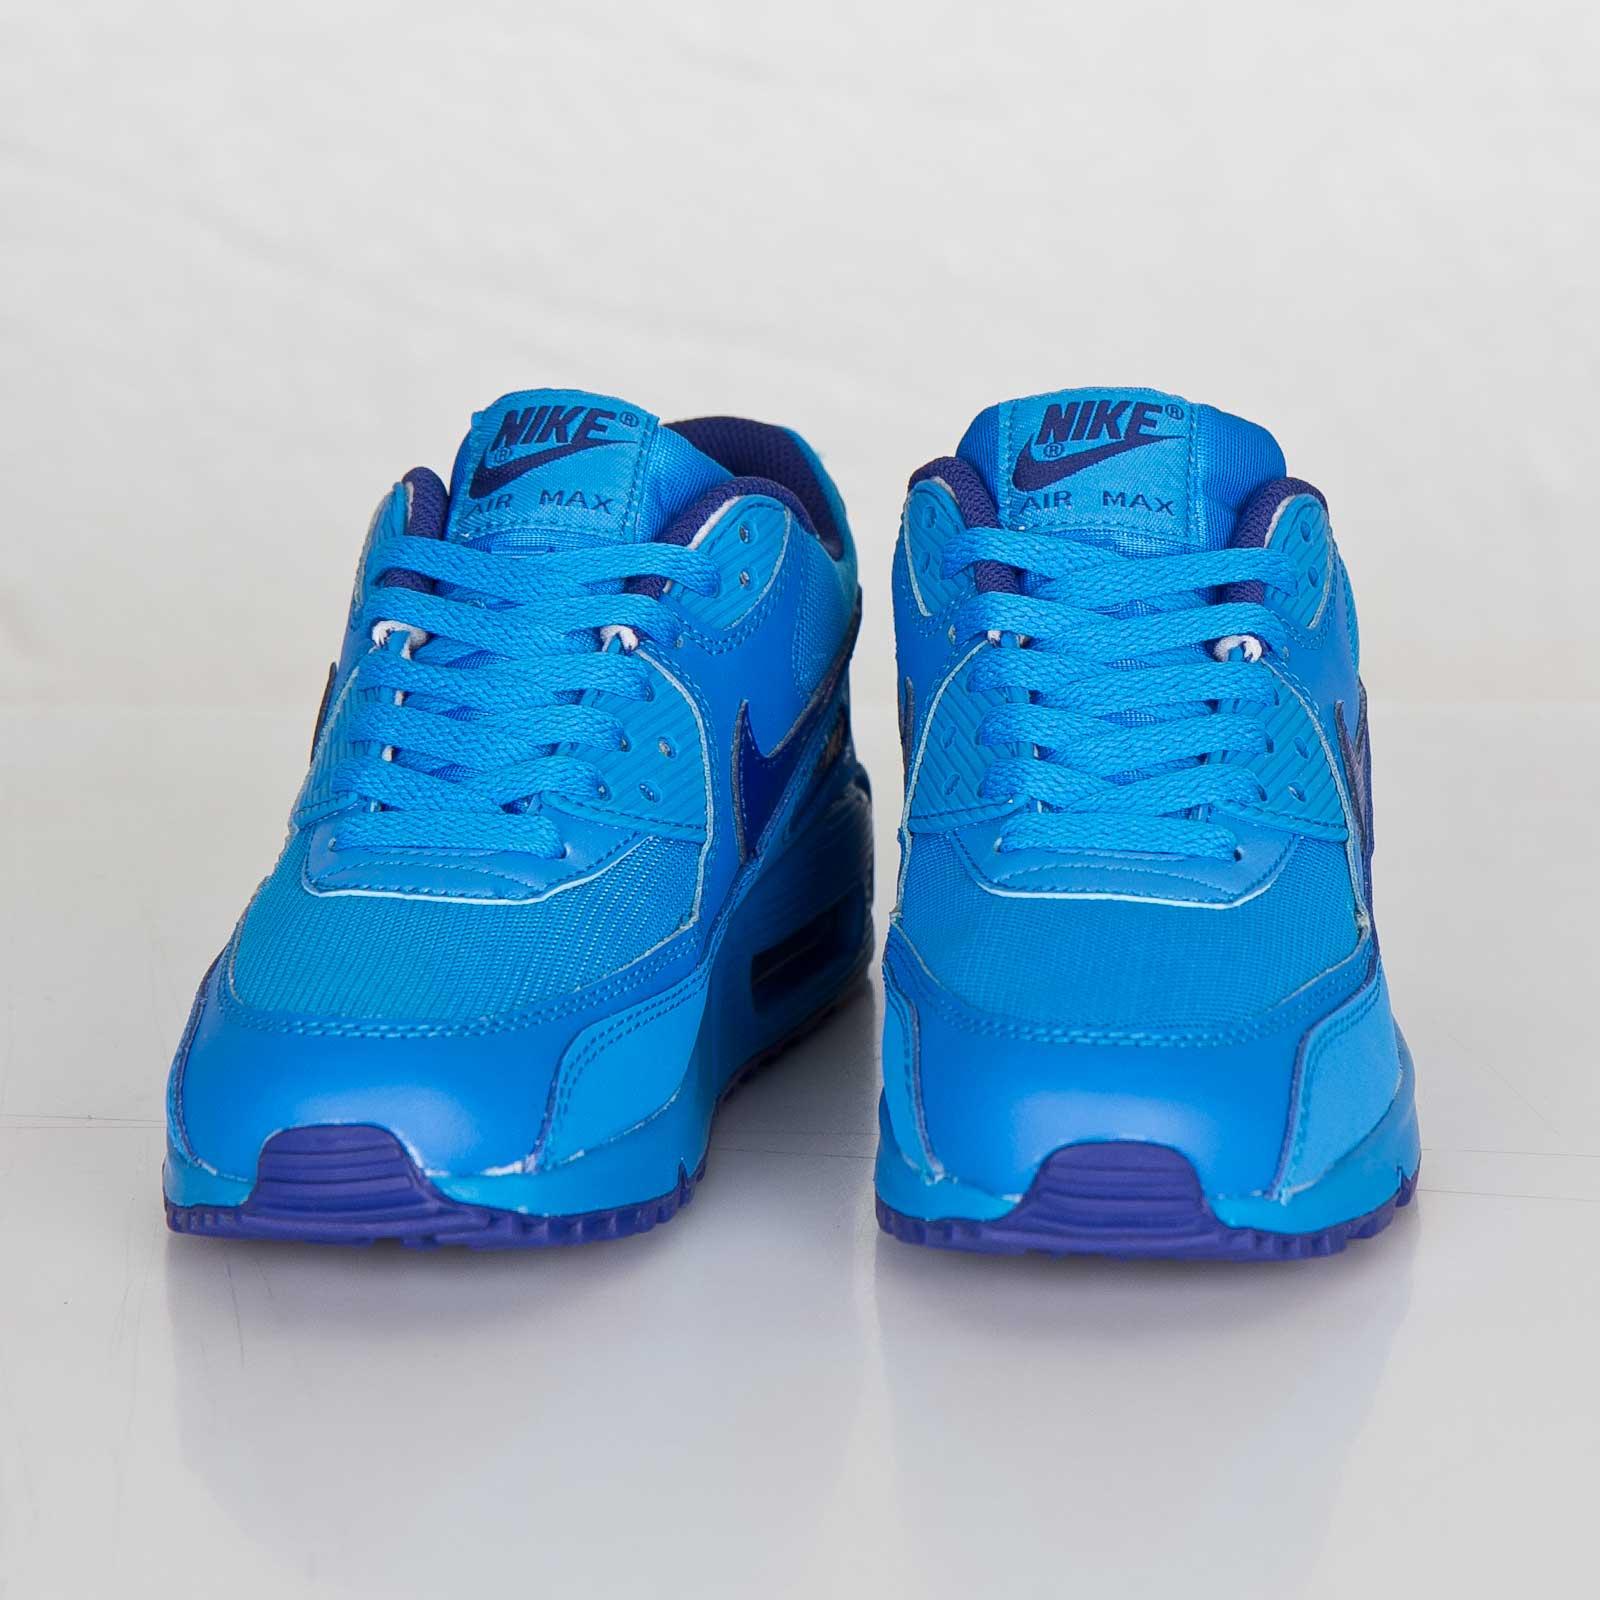 Nike Air Max 90 (GS) 307793 408 Sneakersnstuff